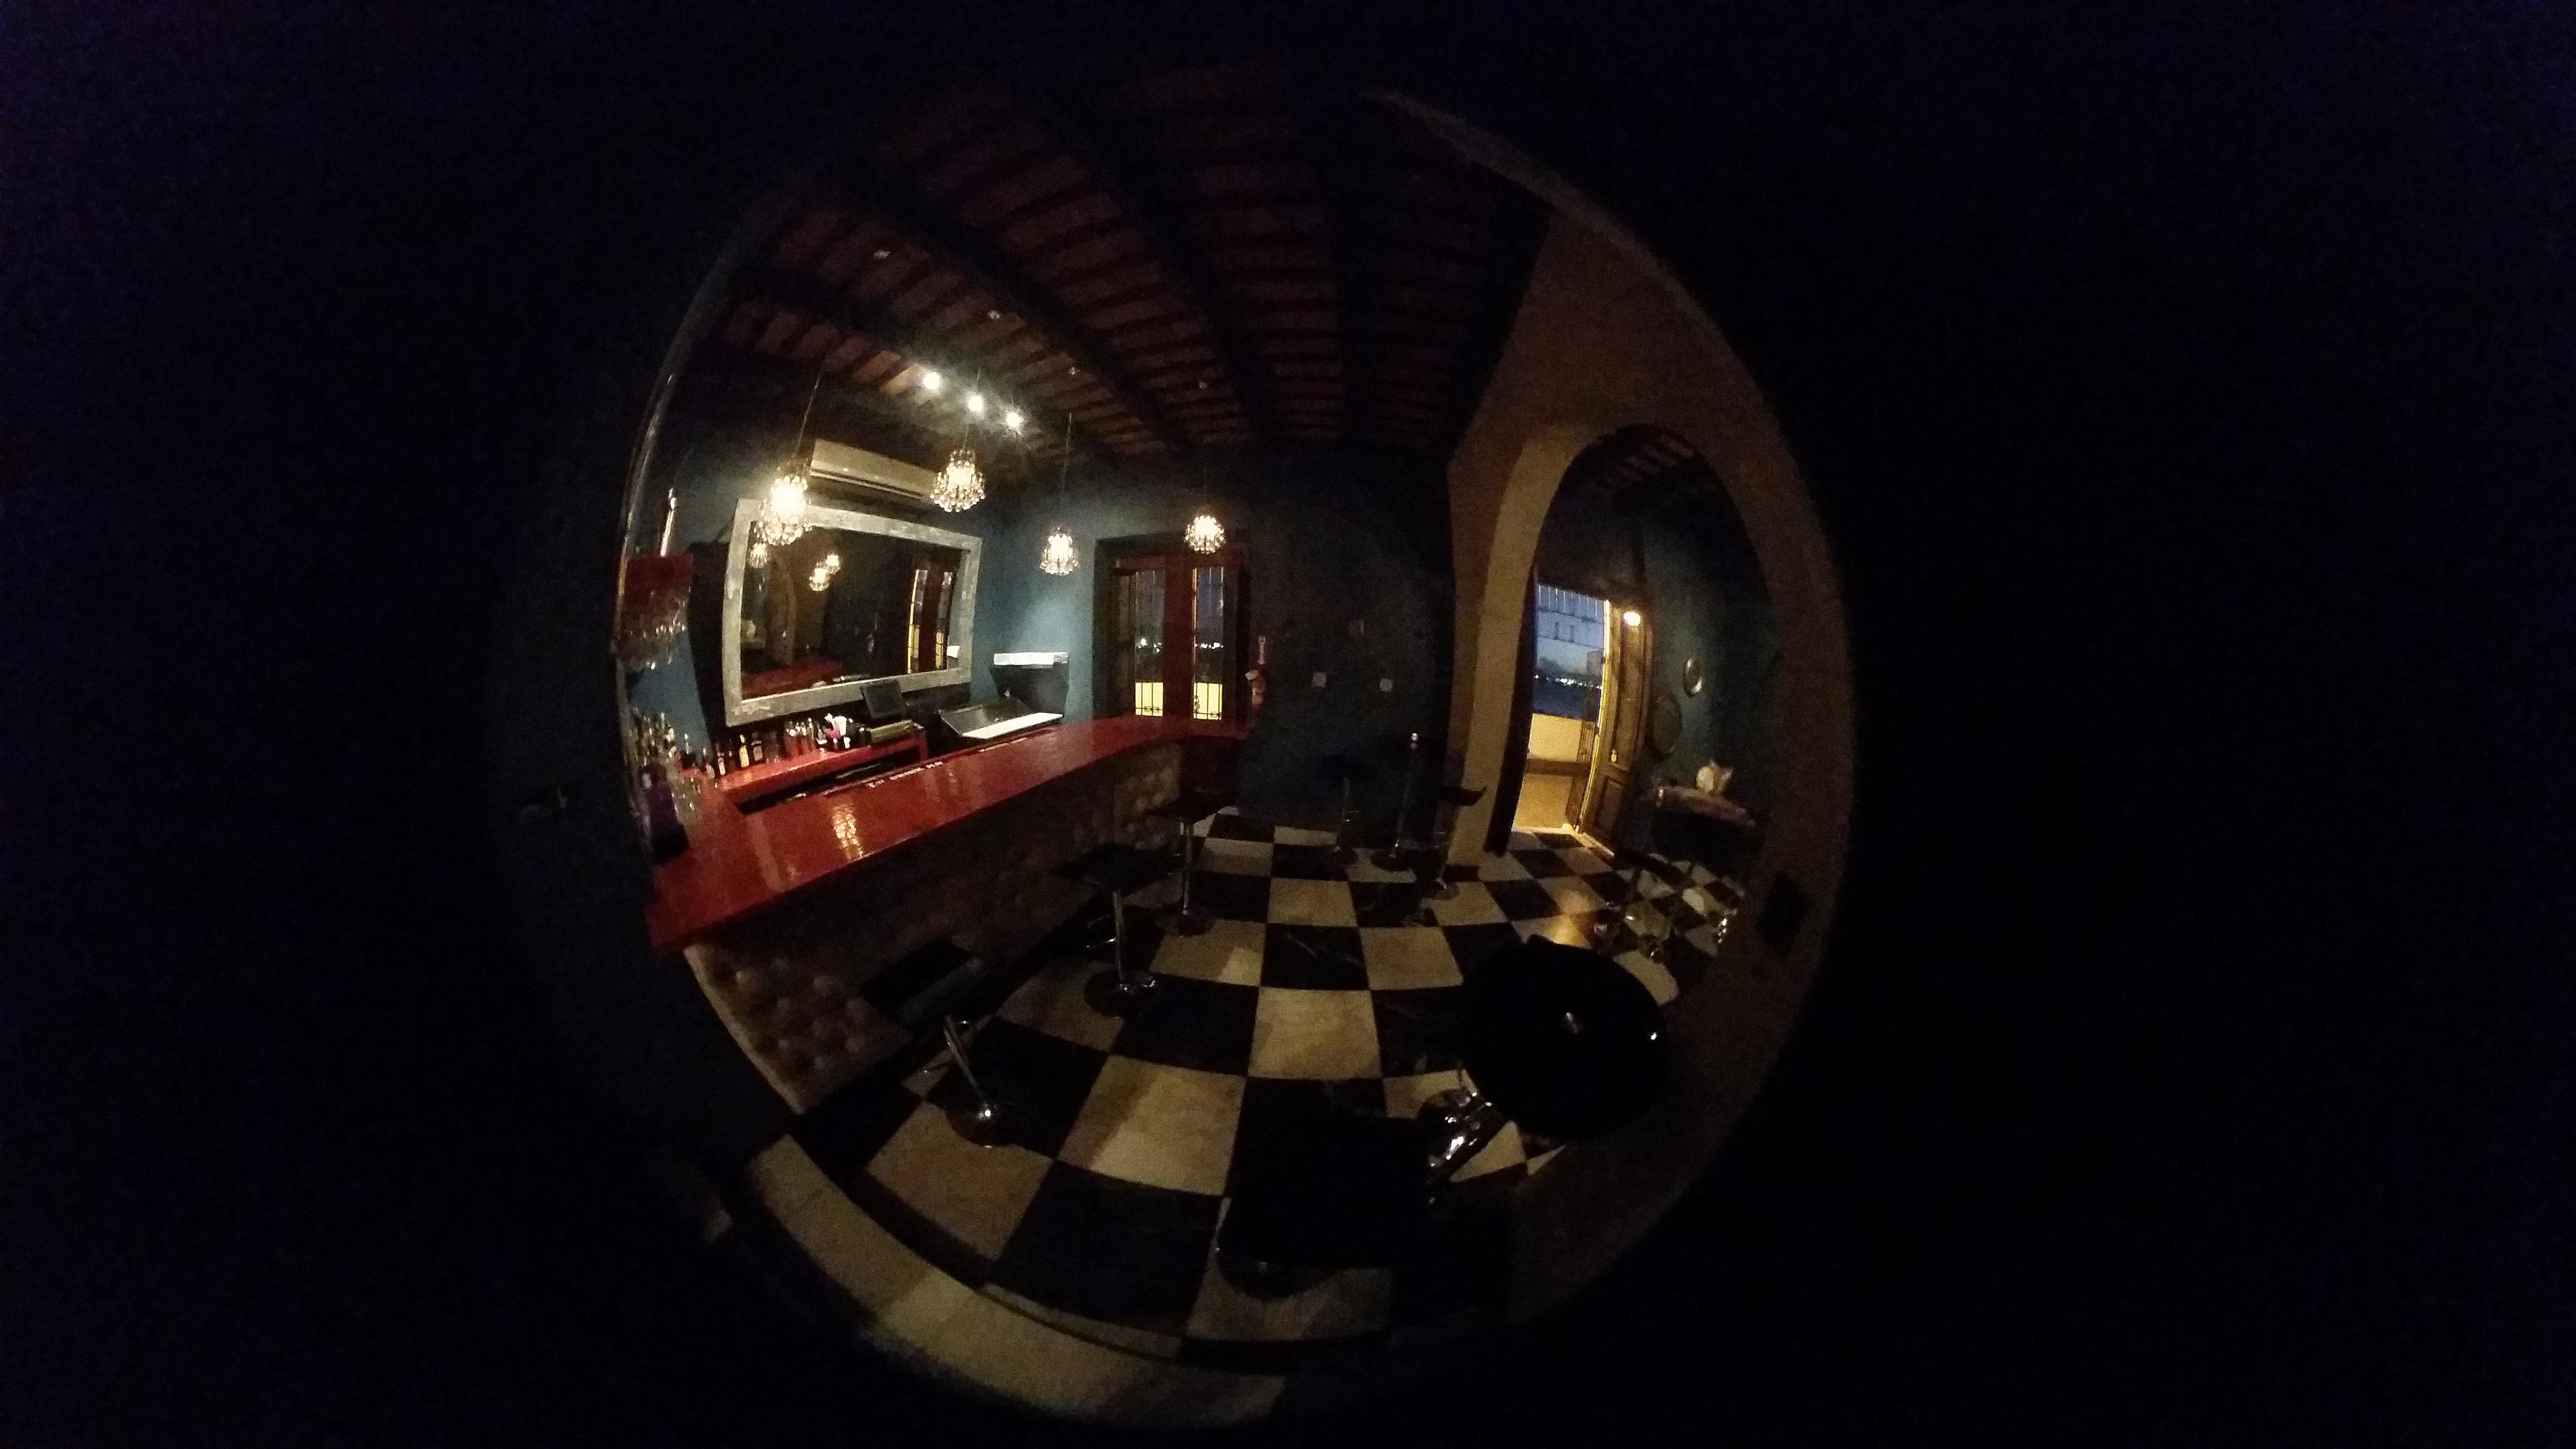 club canape club canape 39 s inside. Black Bedroom Furniture Sets. Home Design Ideas